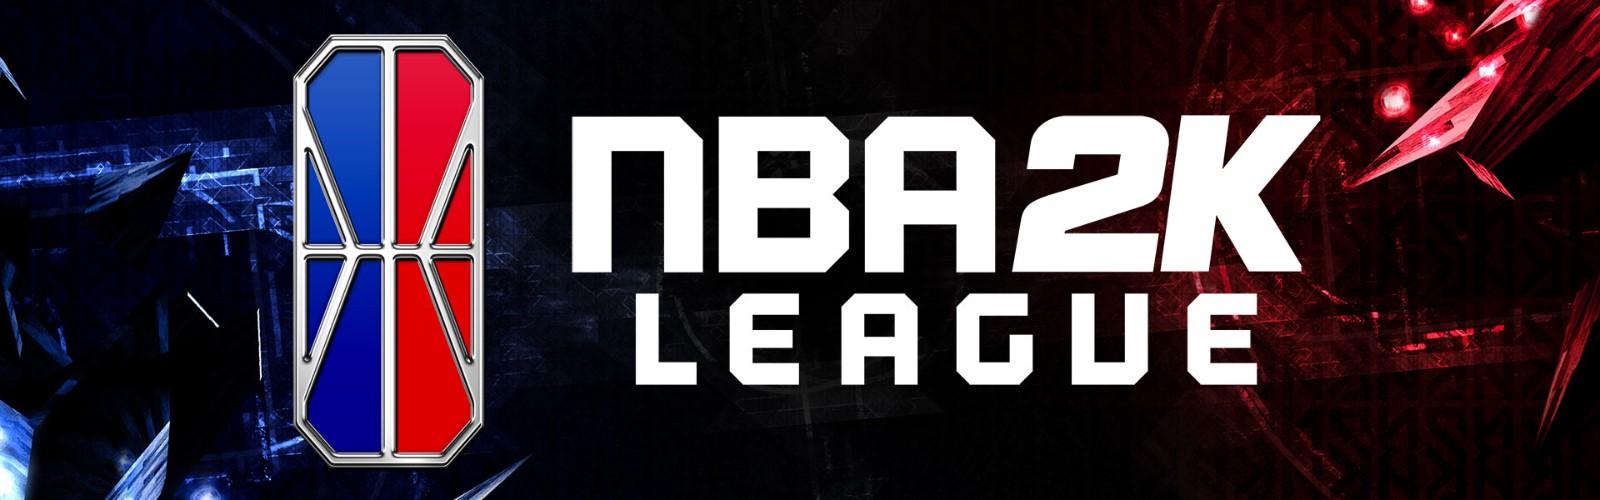 NBA 2K电竞联赛举行首次选秀大会  102名选手参选独行侠获状元签